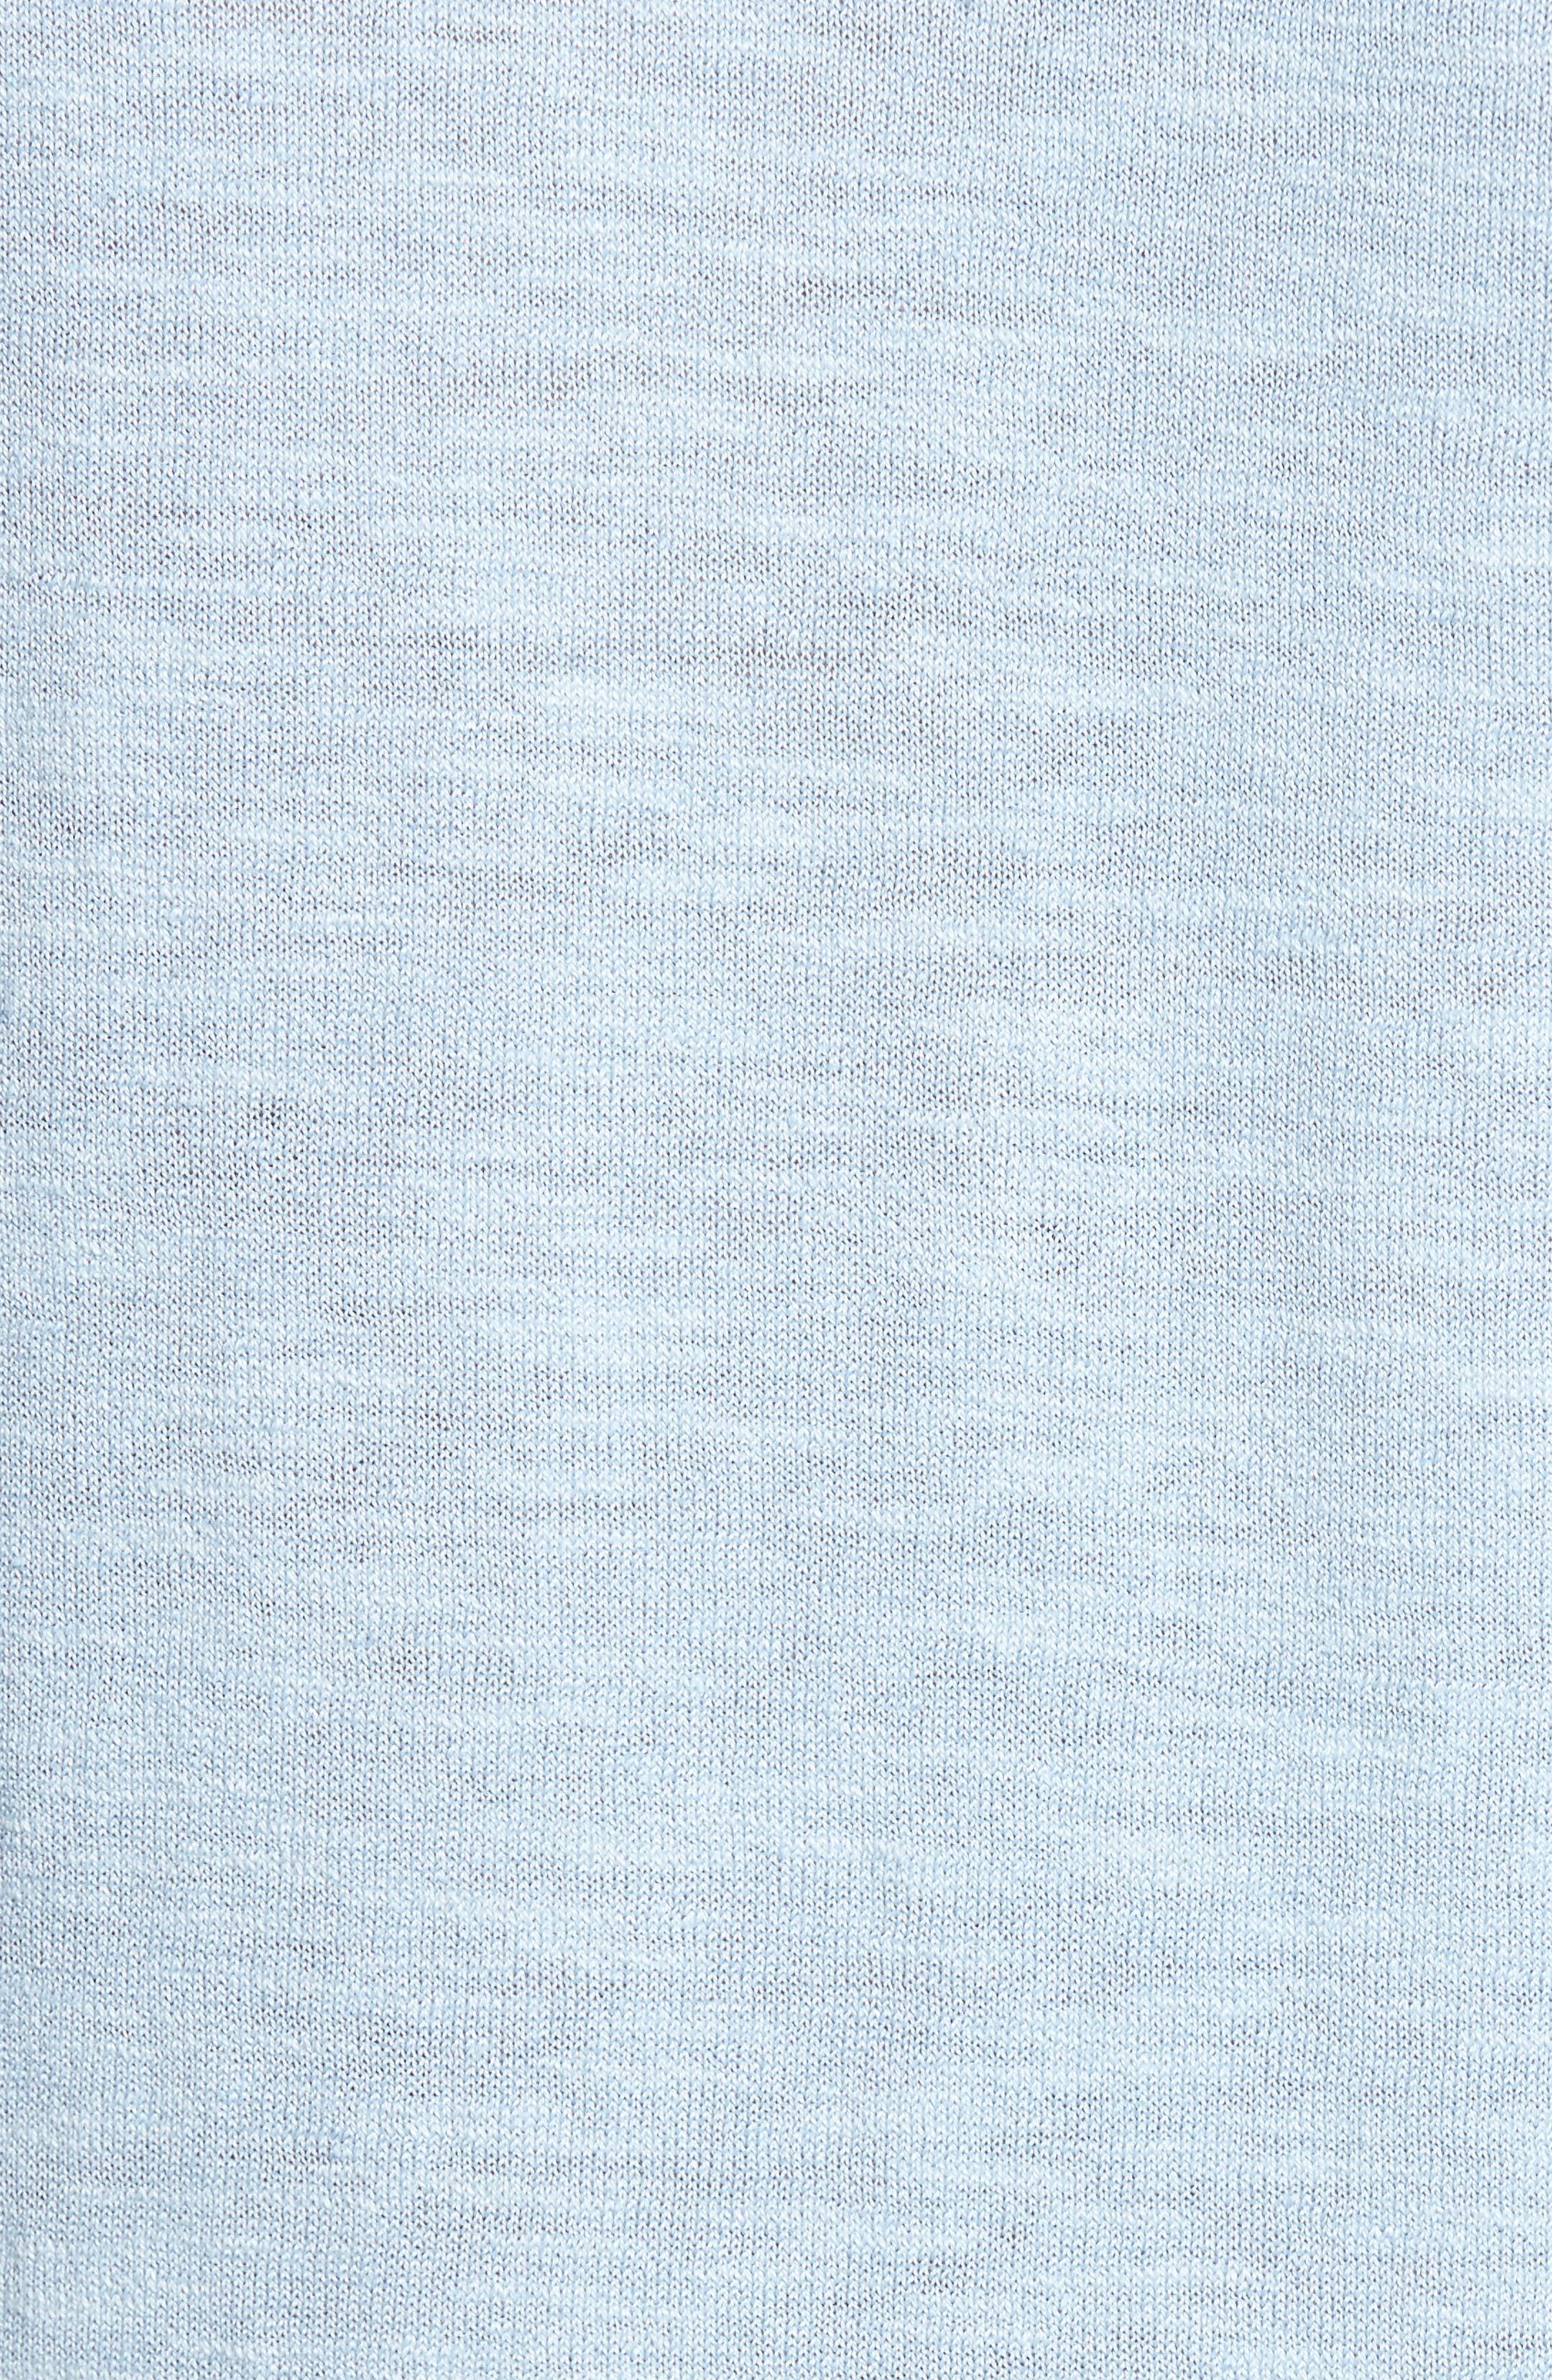 Arambol Cotton & Linen Sweater,                             Alternate thumbnail 5, color,                             Blue Lagoon